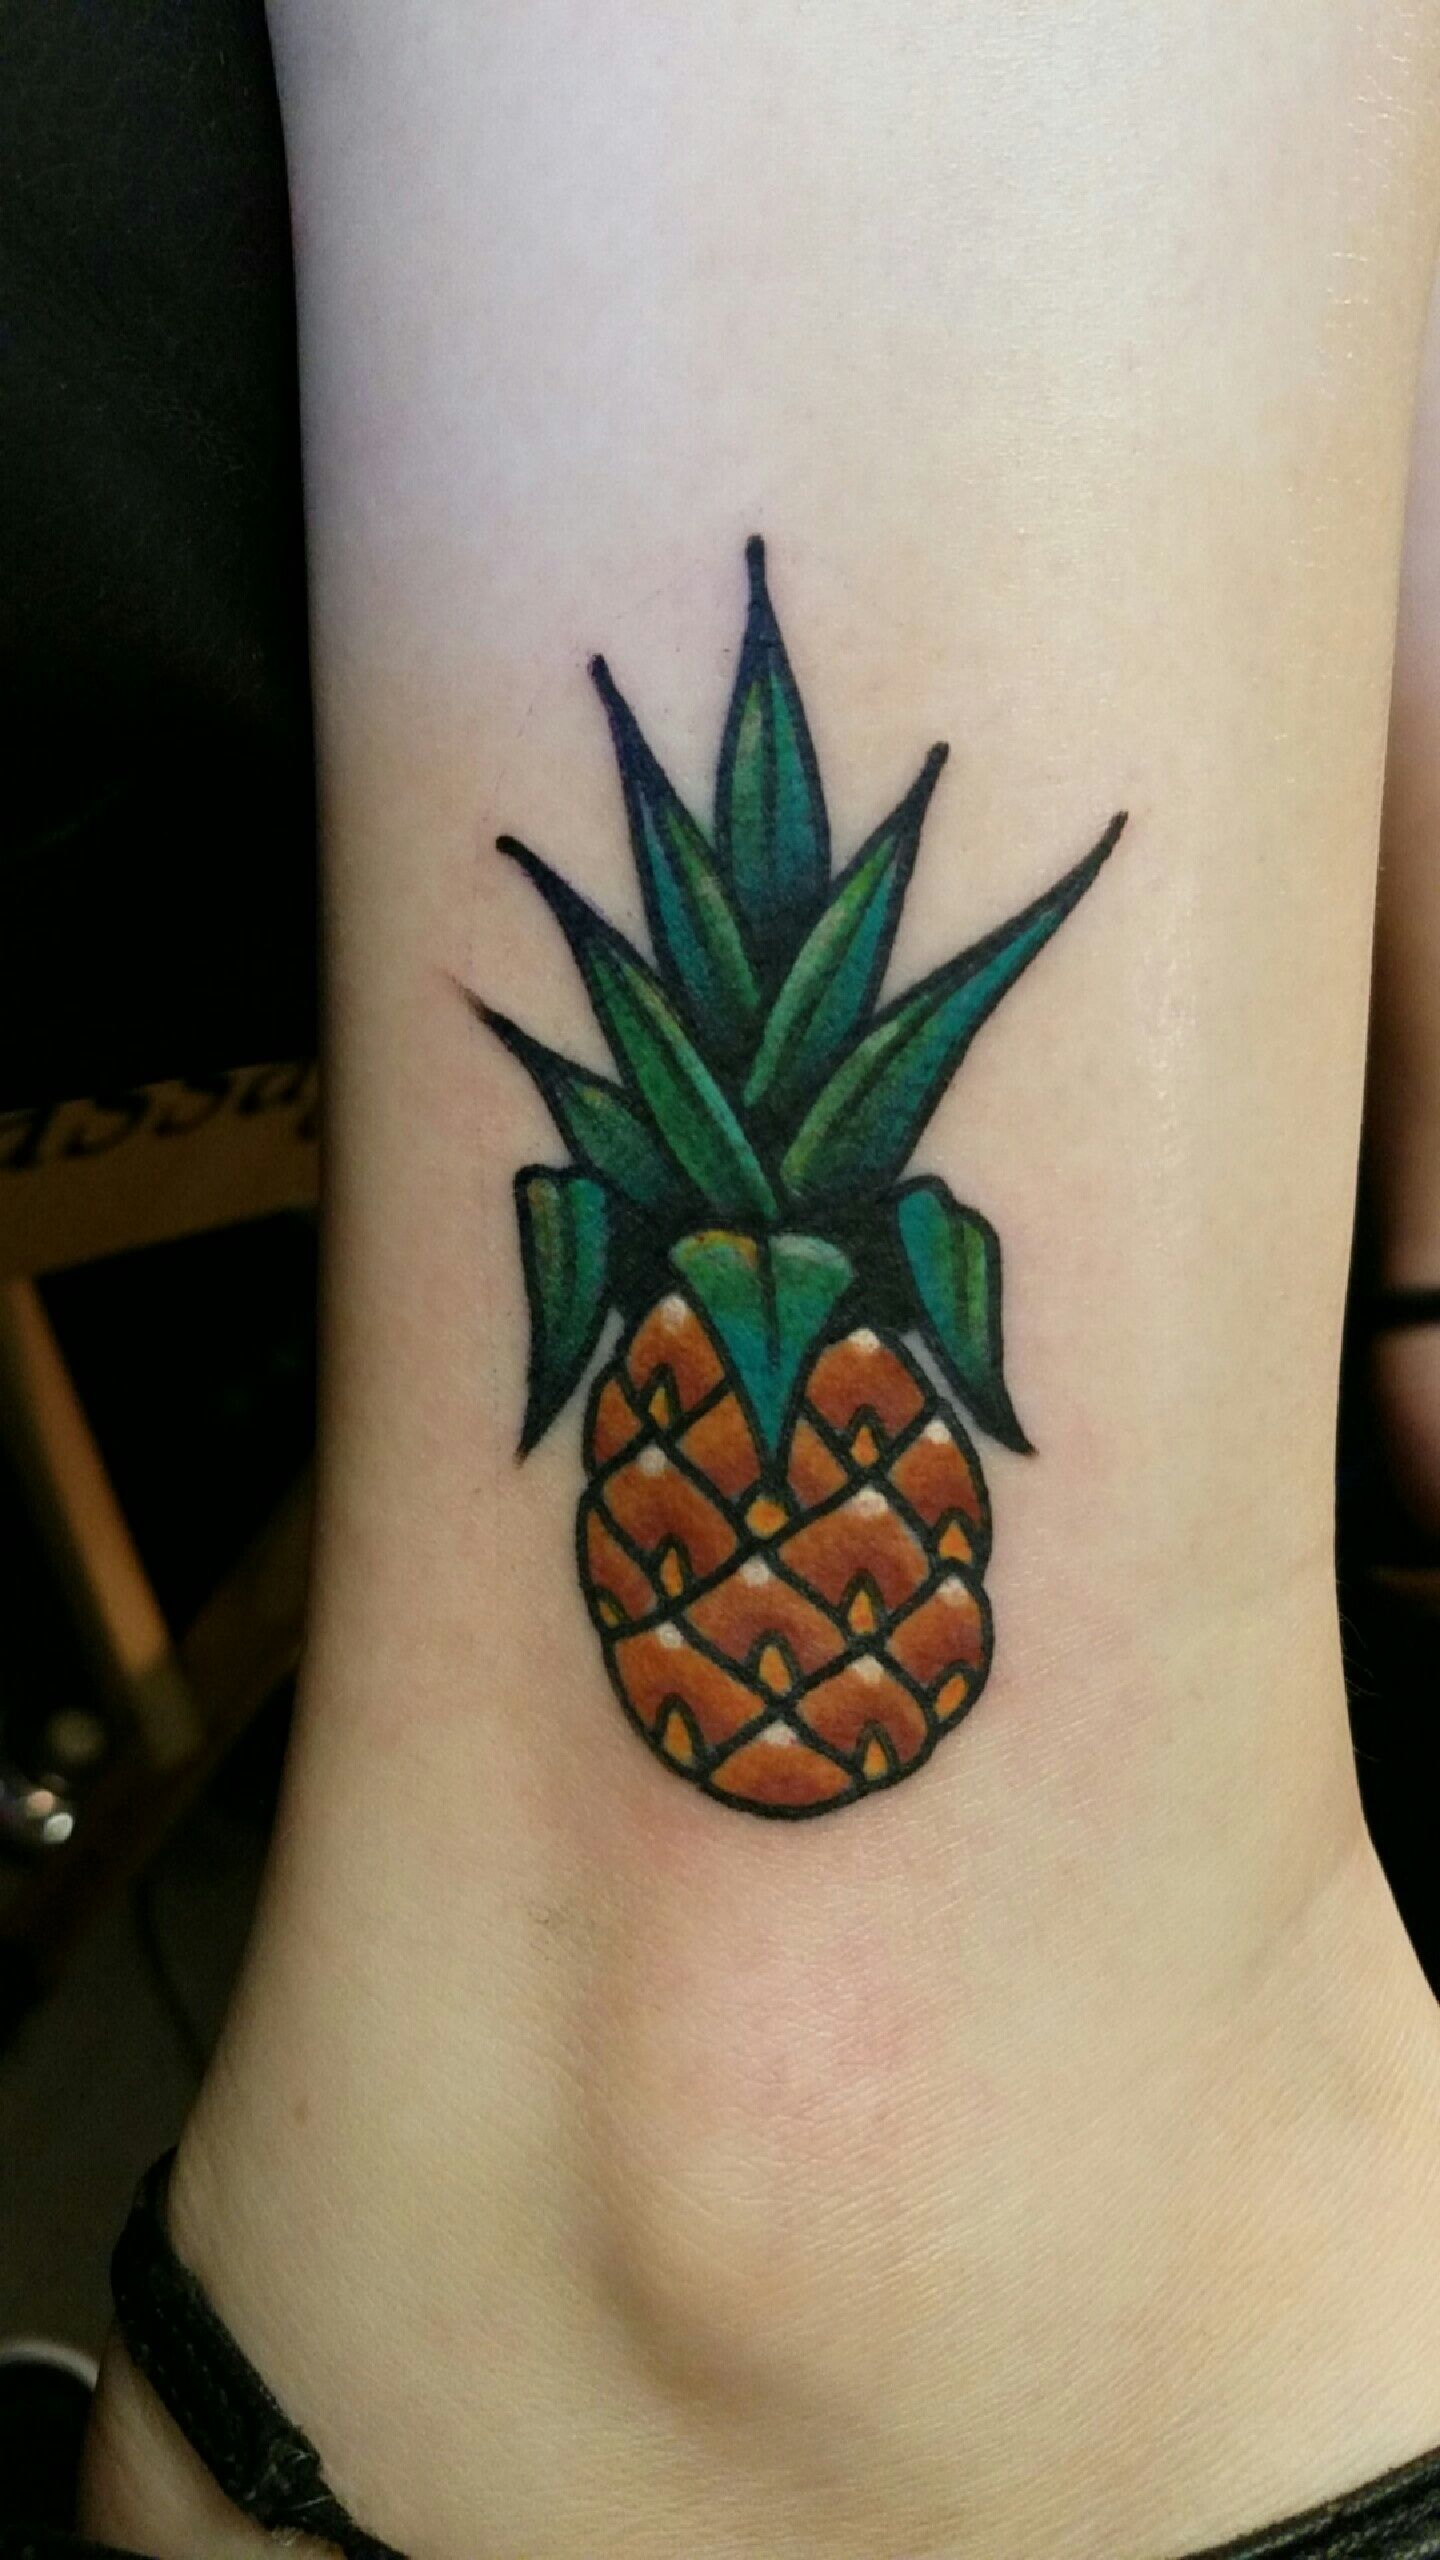 Pineapple By Tyler Nealeigh At Black Lotus Tattoo In Gilbert Arizona Pineapple Tattoo Black Lotus Tattoo Lotus Tattoo